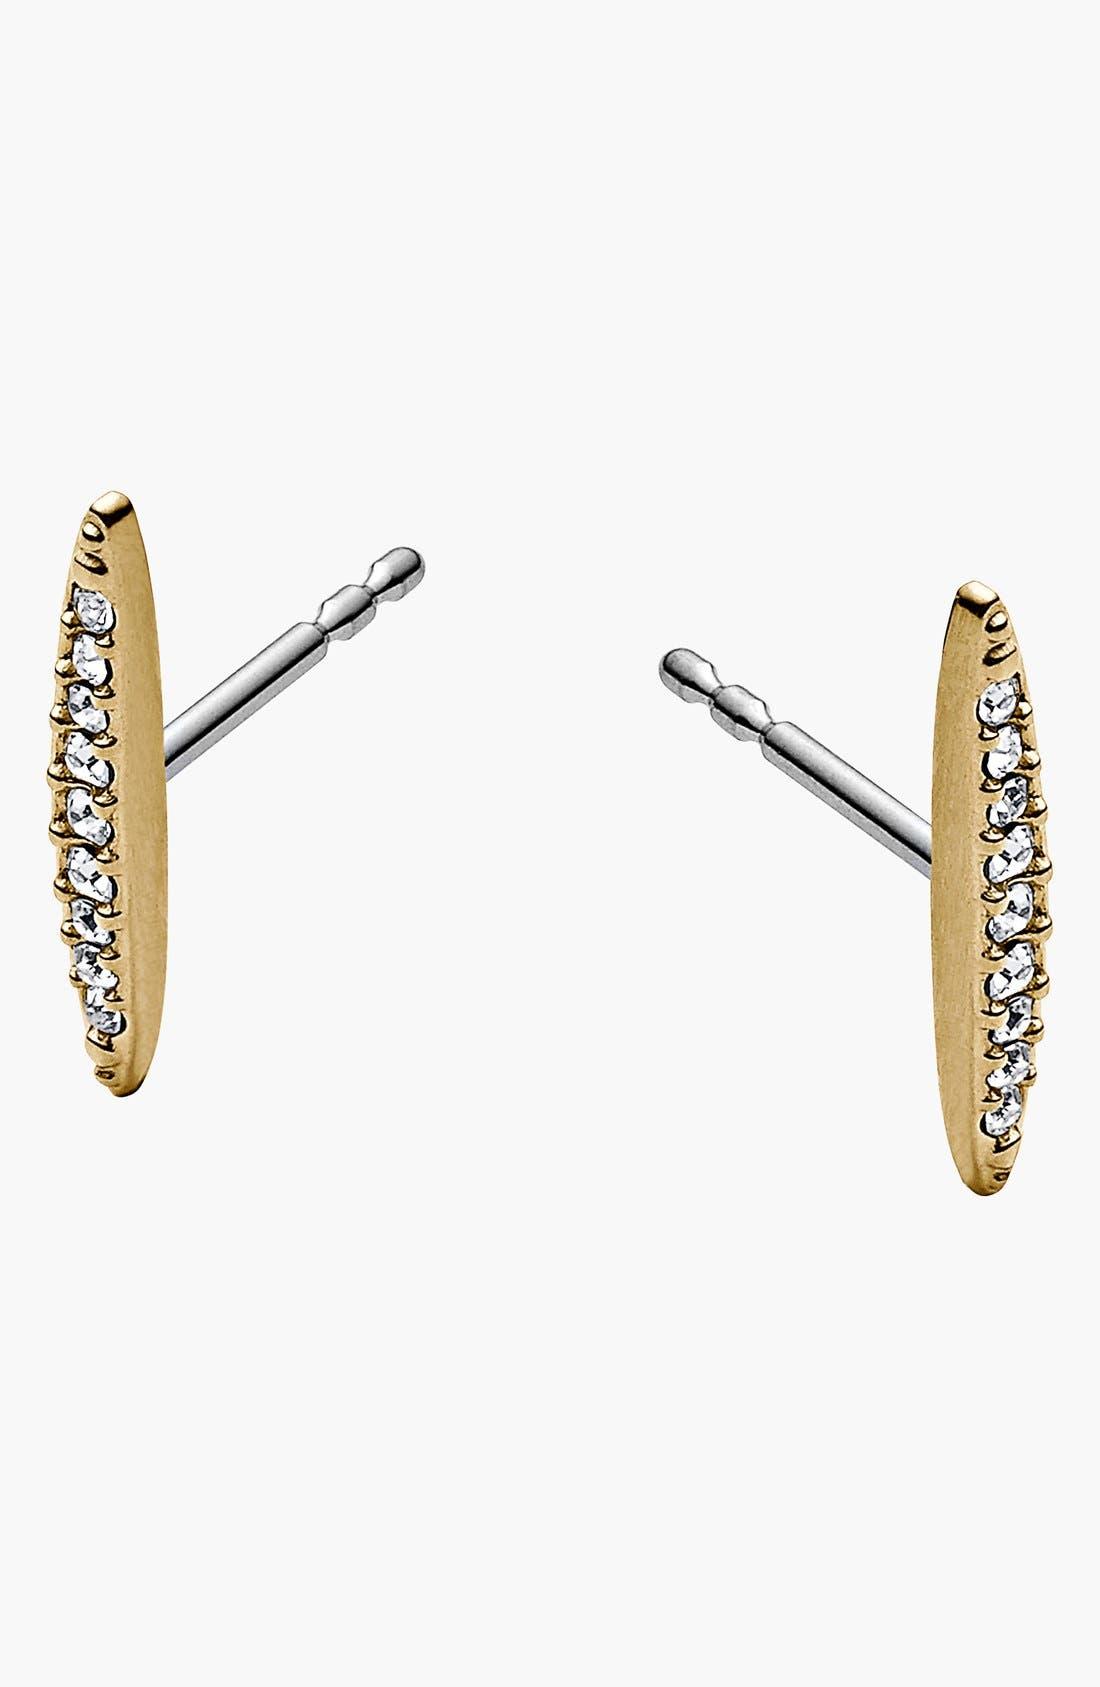 Main Image - Michael Kors 'Matchstick' Pavé Stud Earrings